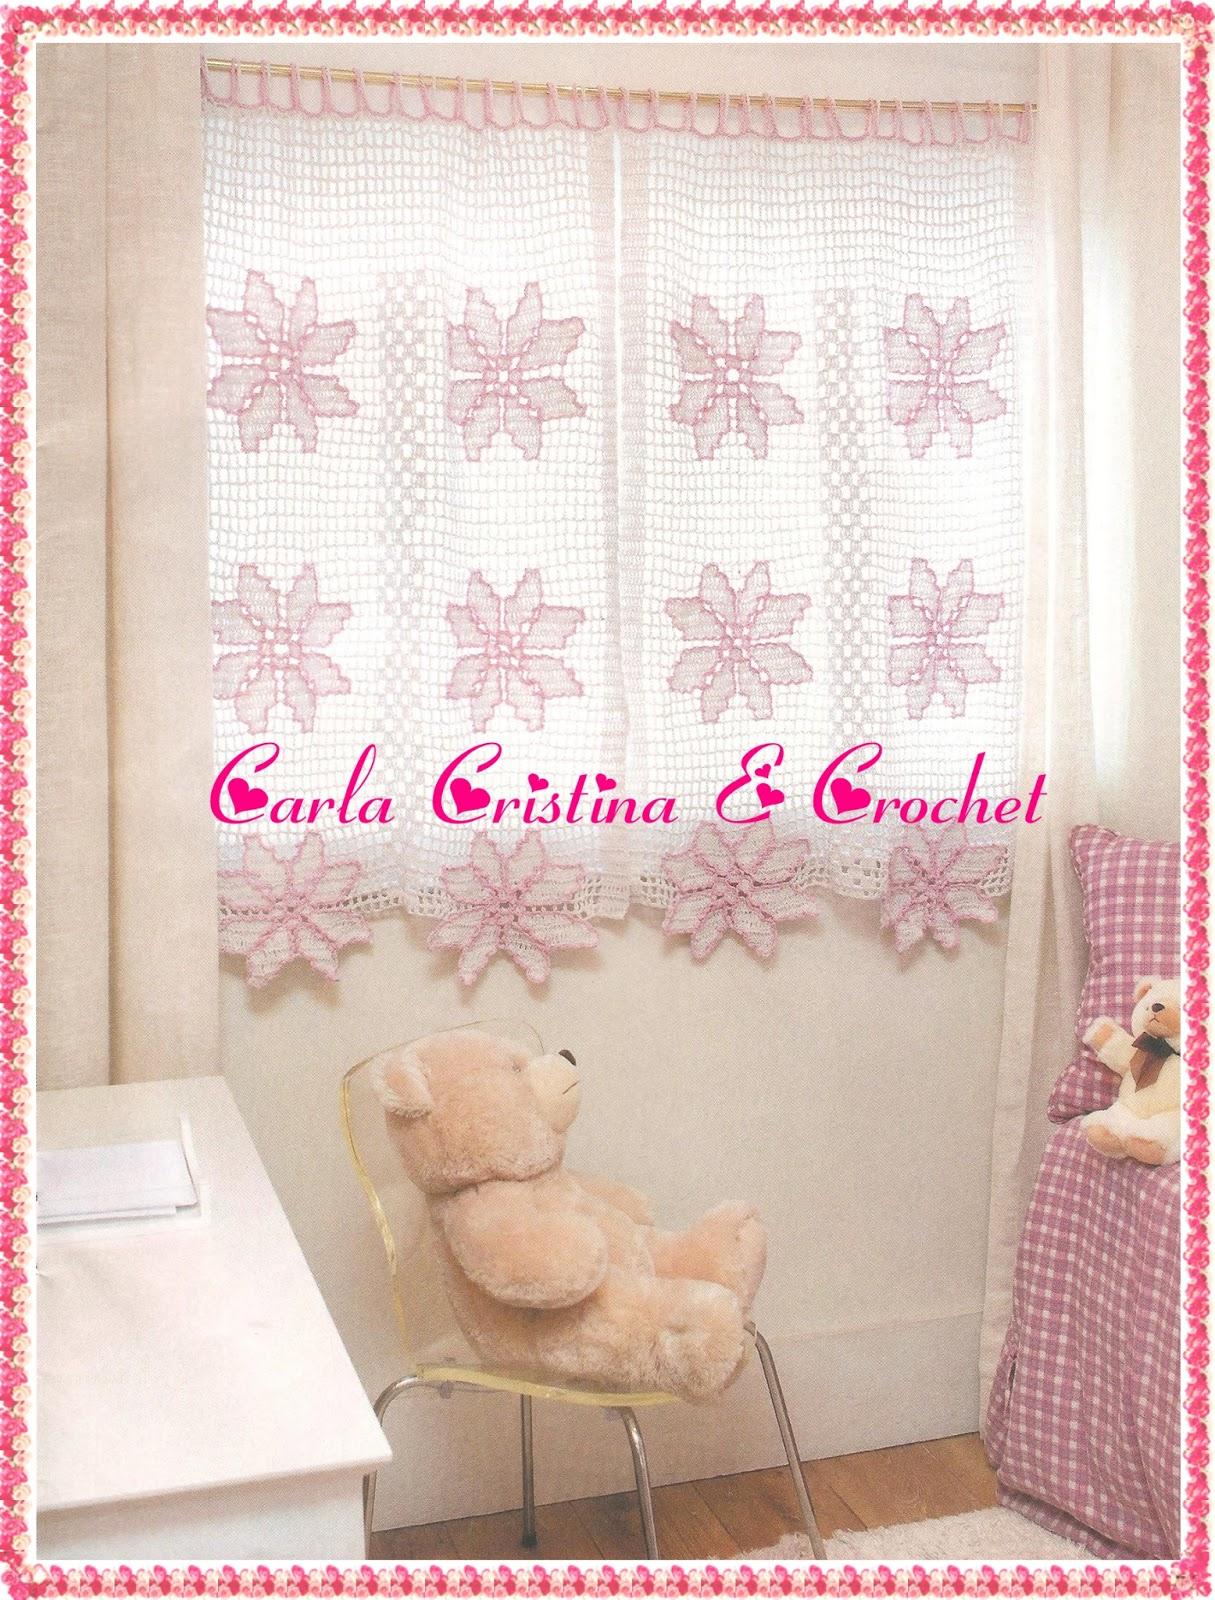 Carla Cristina & Crochet Cortinas em Crochê Infantil